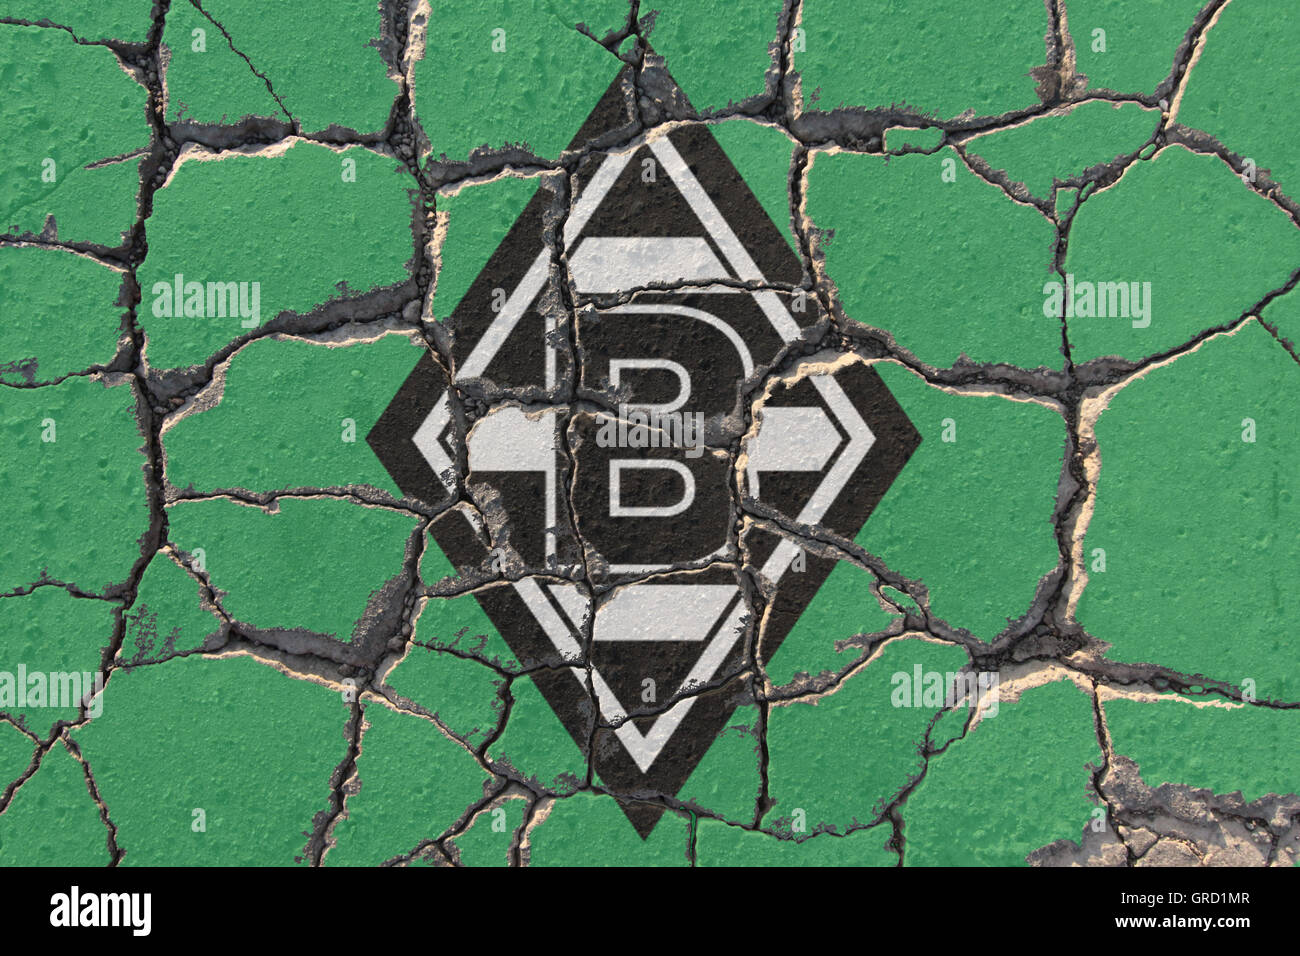 Eroding Sign Of Soccer Club Borussia Moenchengladbach - Stock Image